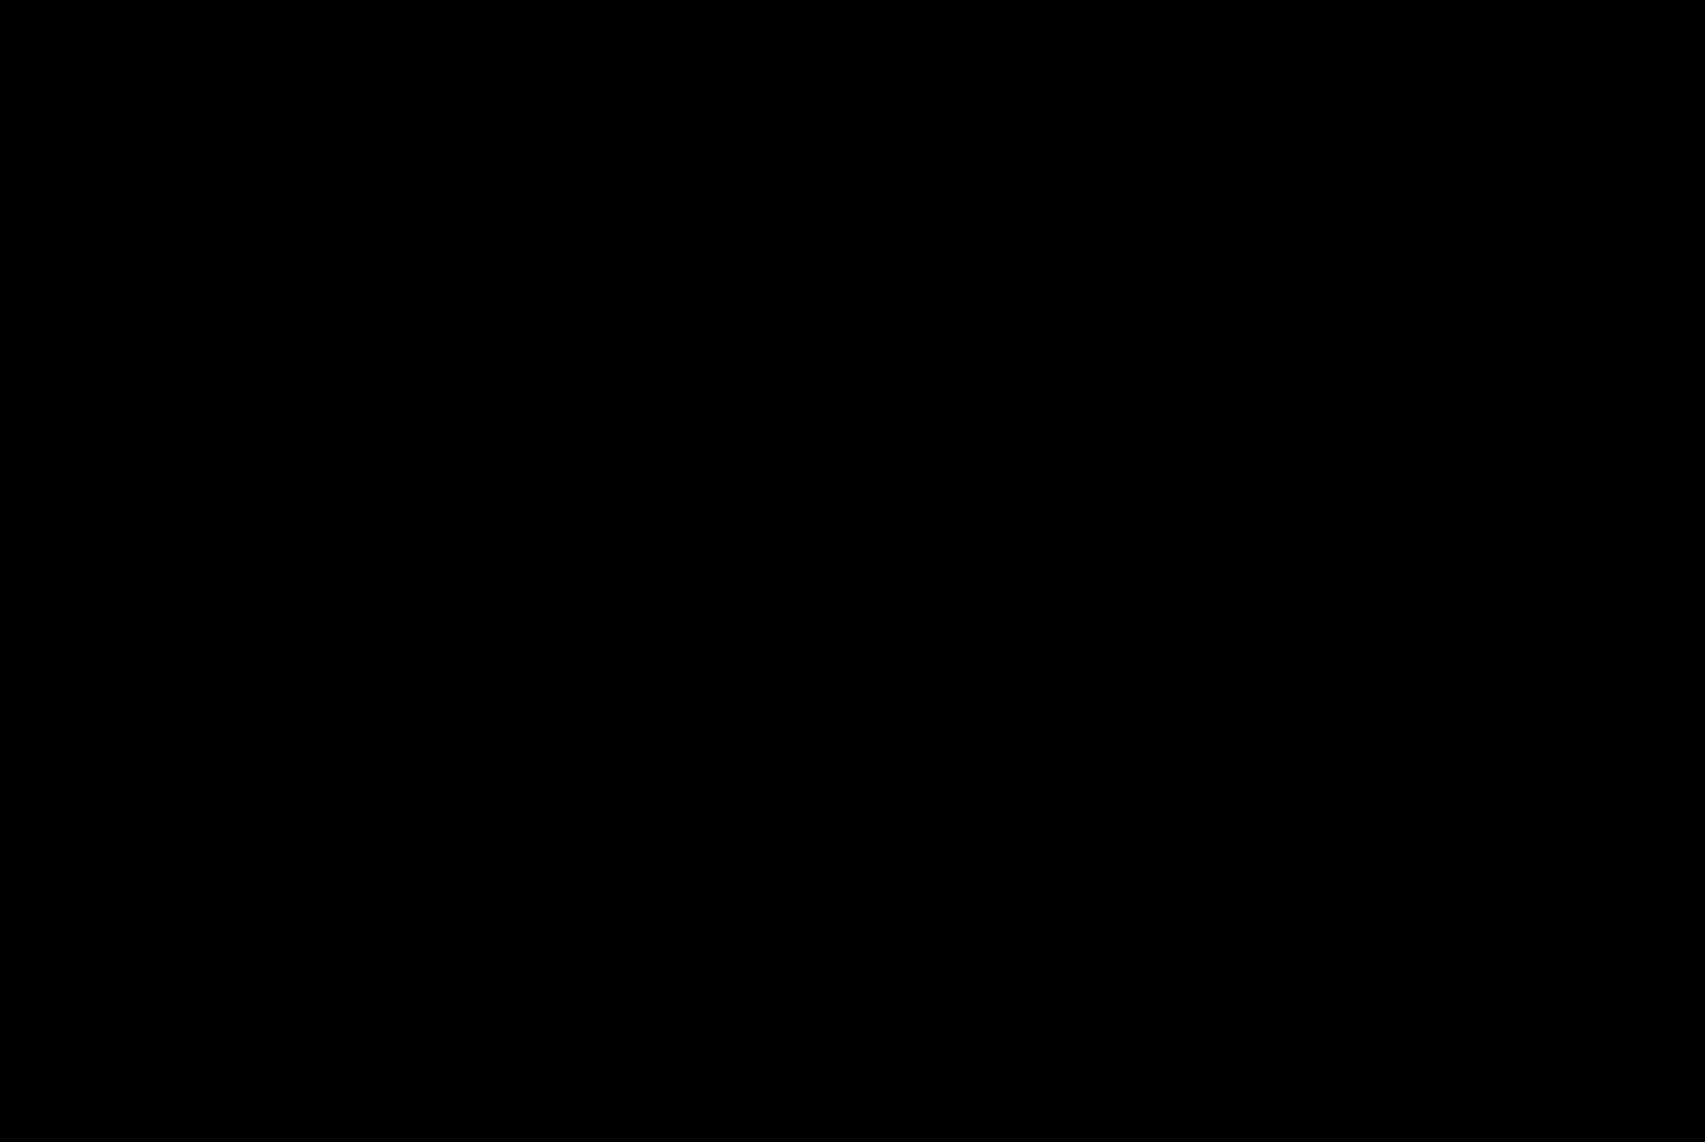 c86ad019-c33c-4ae5-8a14-8f6710690810